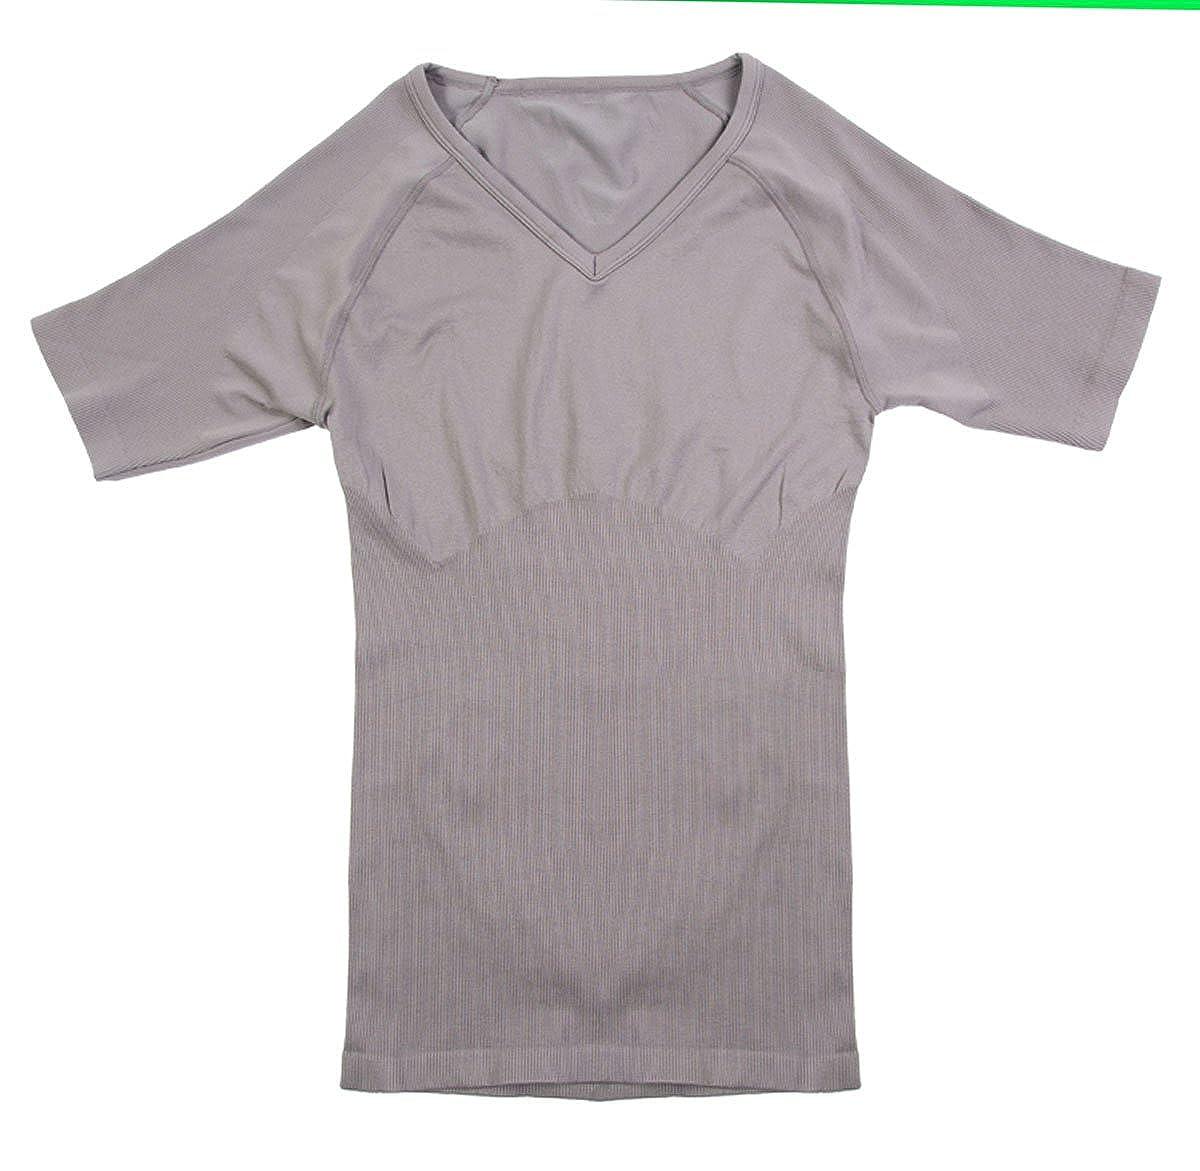 Adidas BR4067 Camiseta 3825c7b6e1850